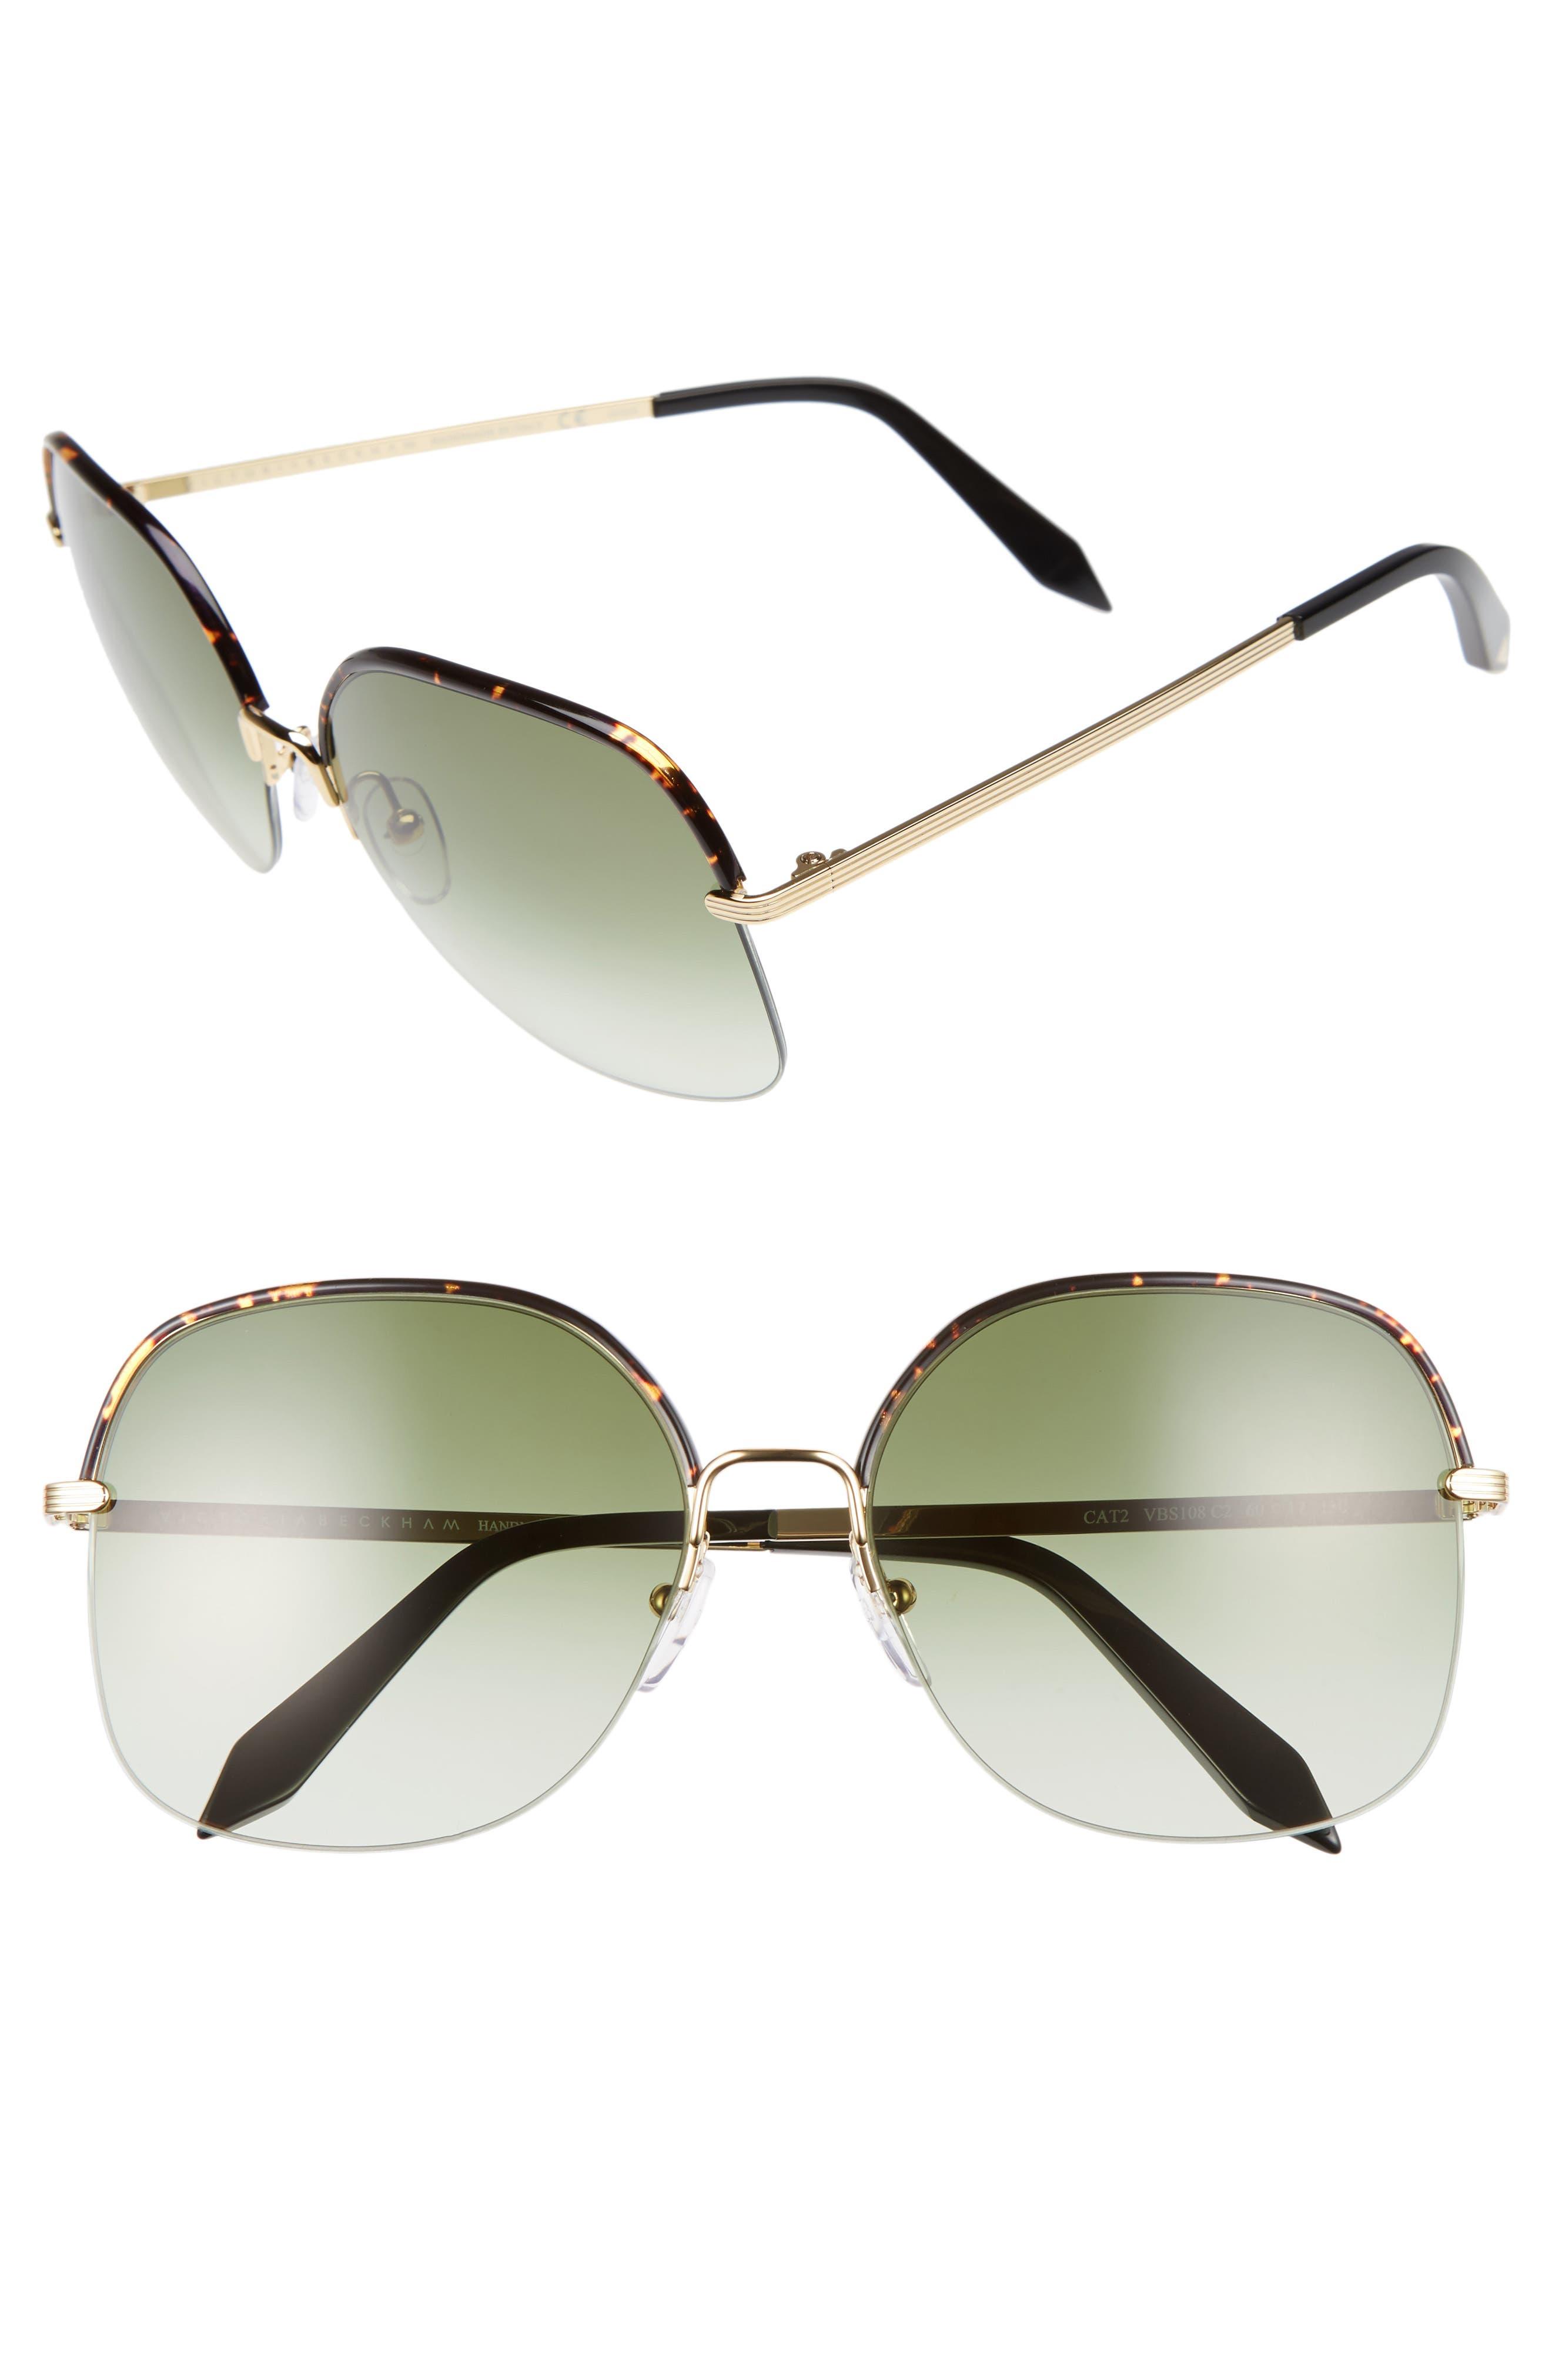 Alternate Image 1 Selected - Victoria Beckham Windsor 60mm Gradient Lens Square Sunglasses